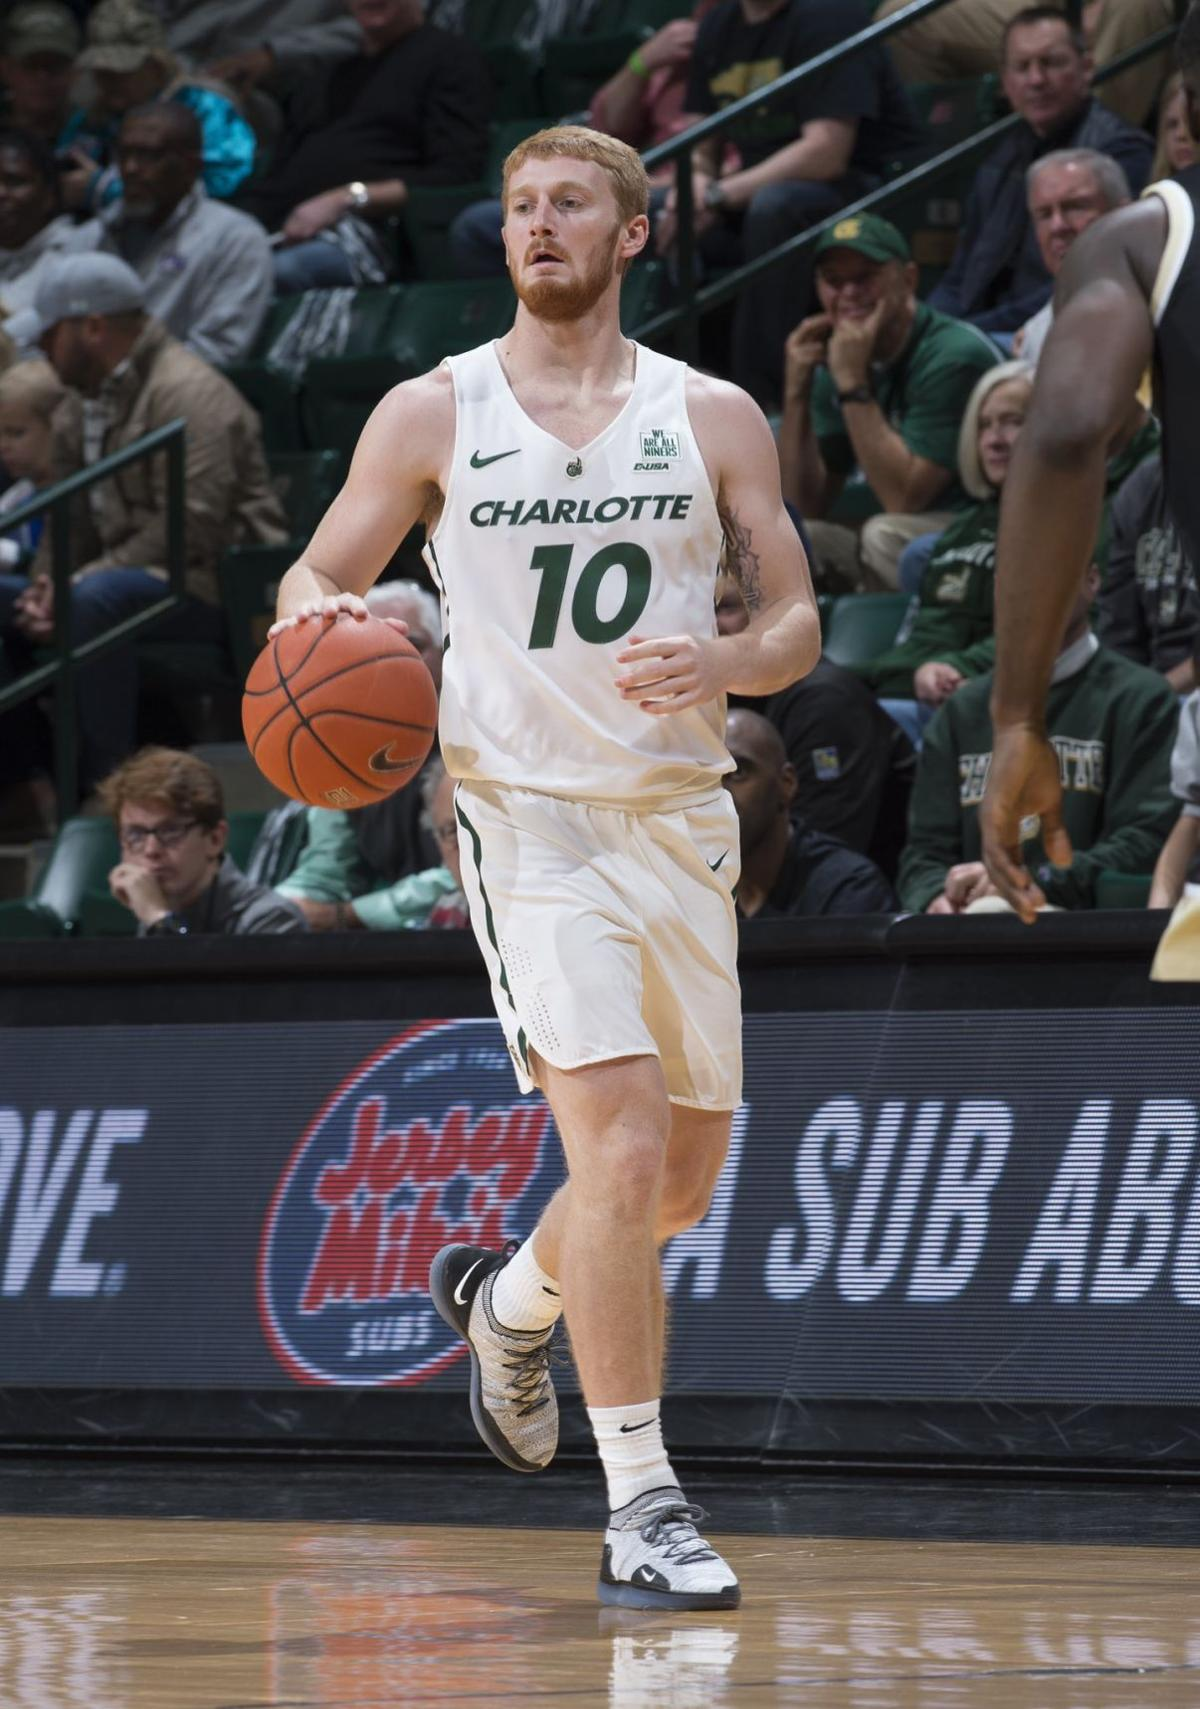 Cooper Robb commits to EKU men's basketball program